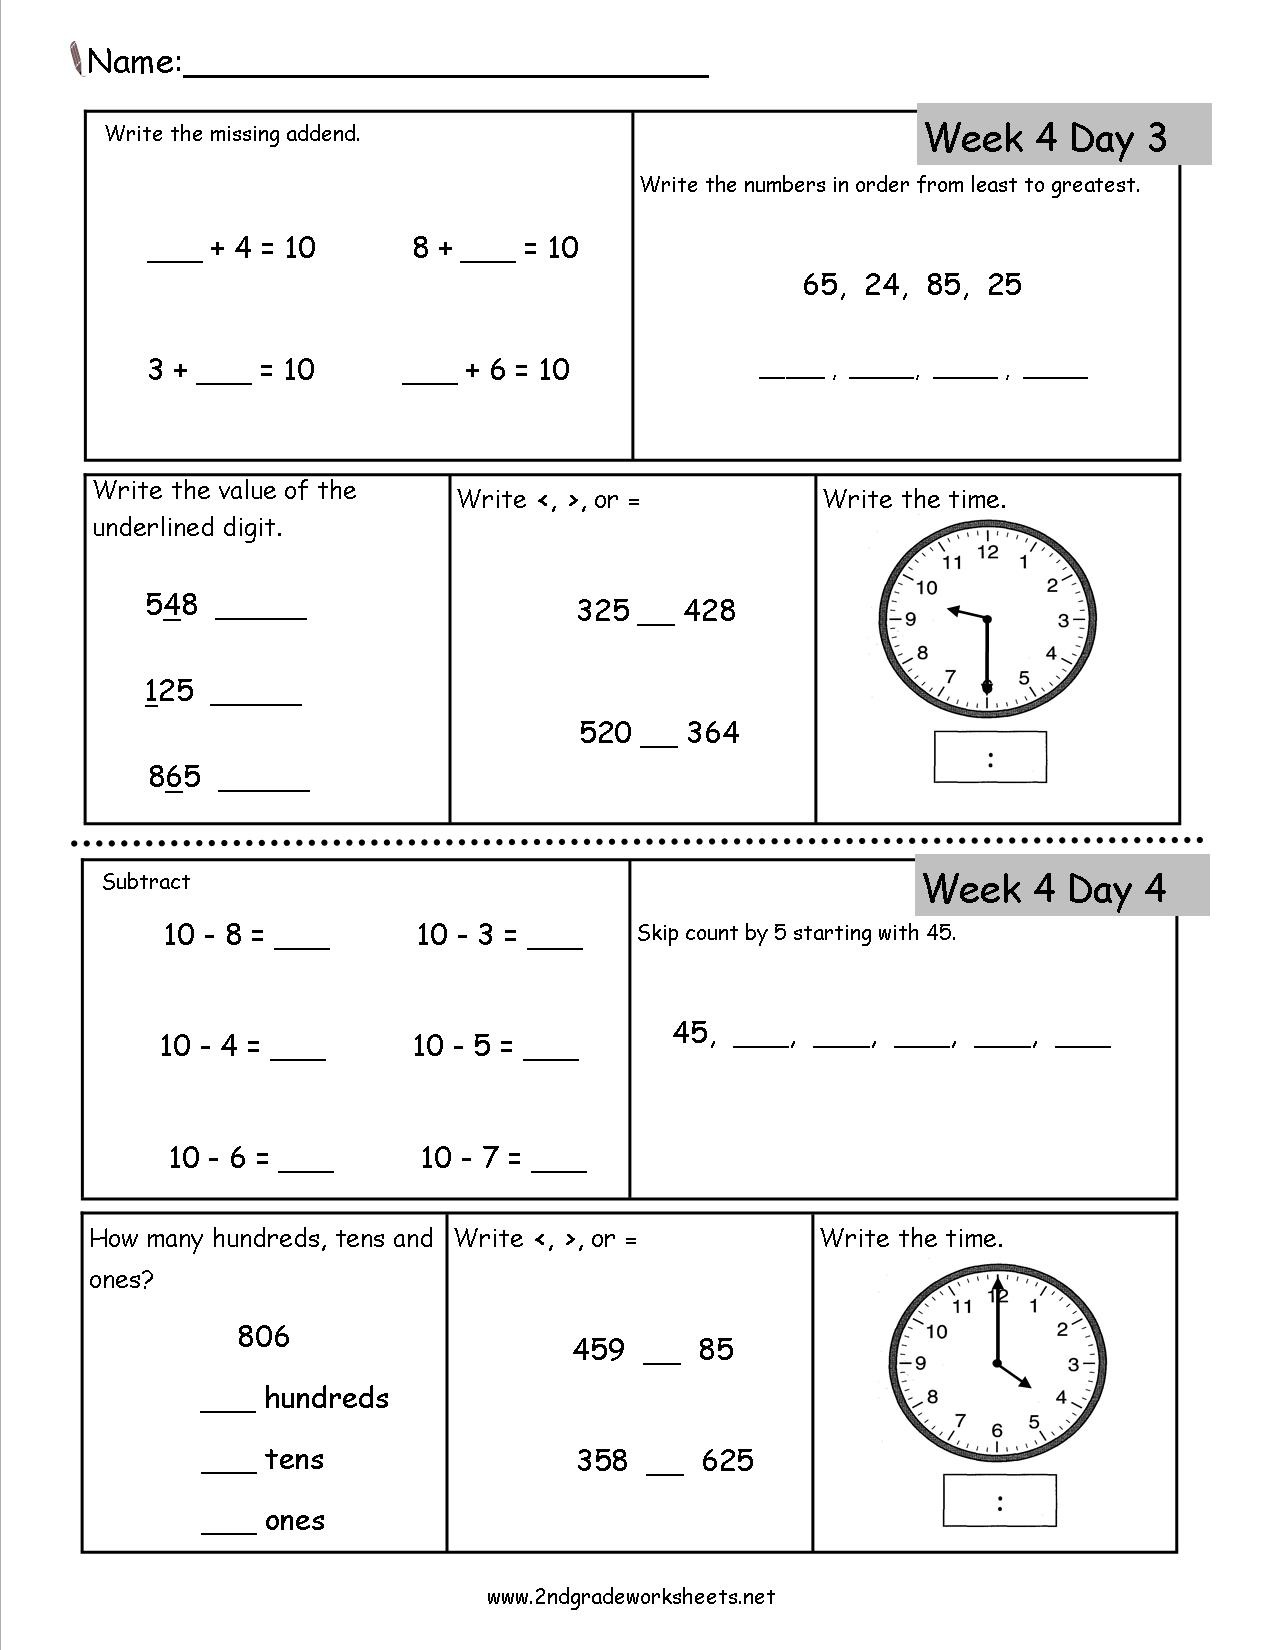 Free 2Nd Grade Daily Math Worksheets - Free Printable Activity Sheets For 2Nd Grade